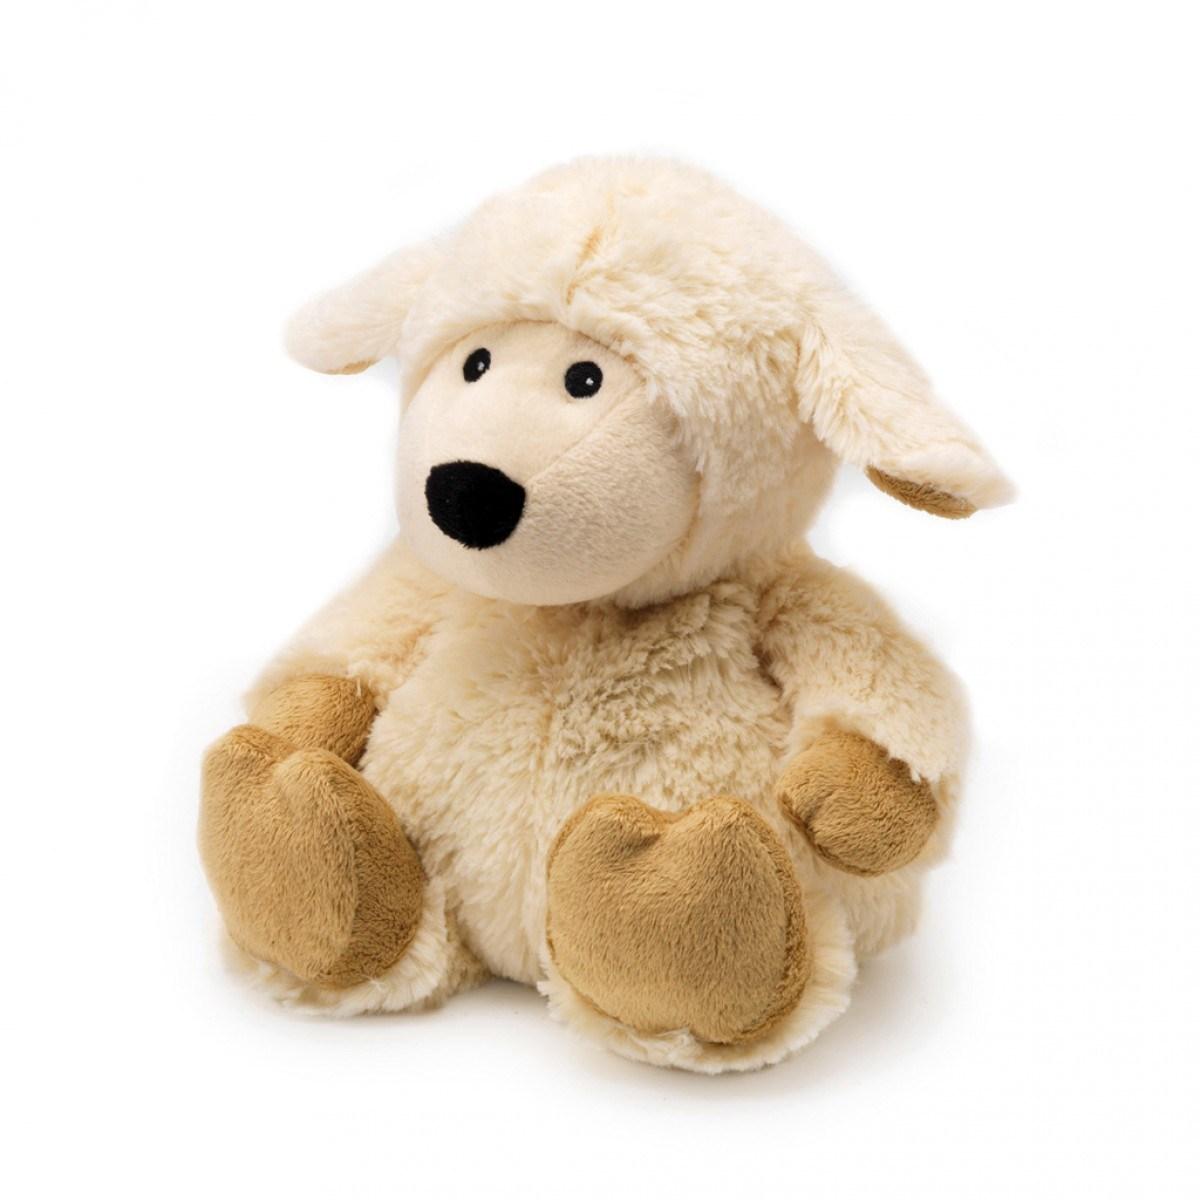 Cuddle Super Soft Plush Toy Sheep